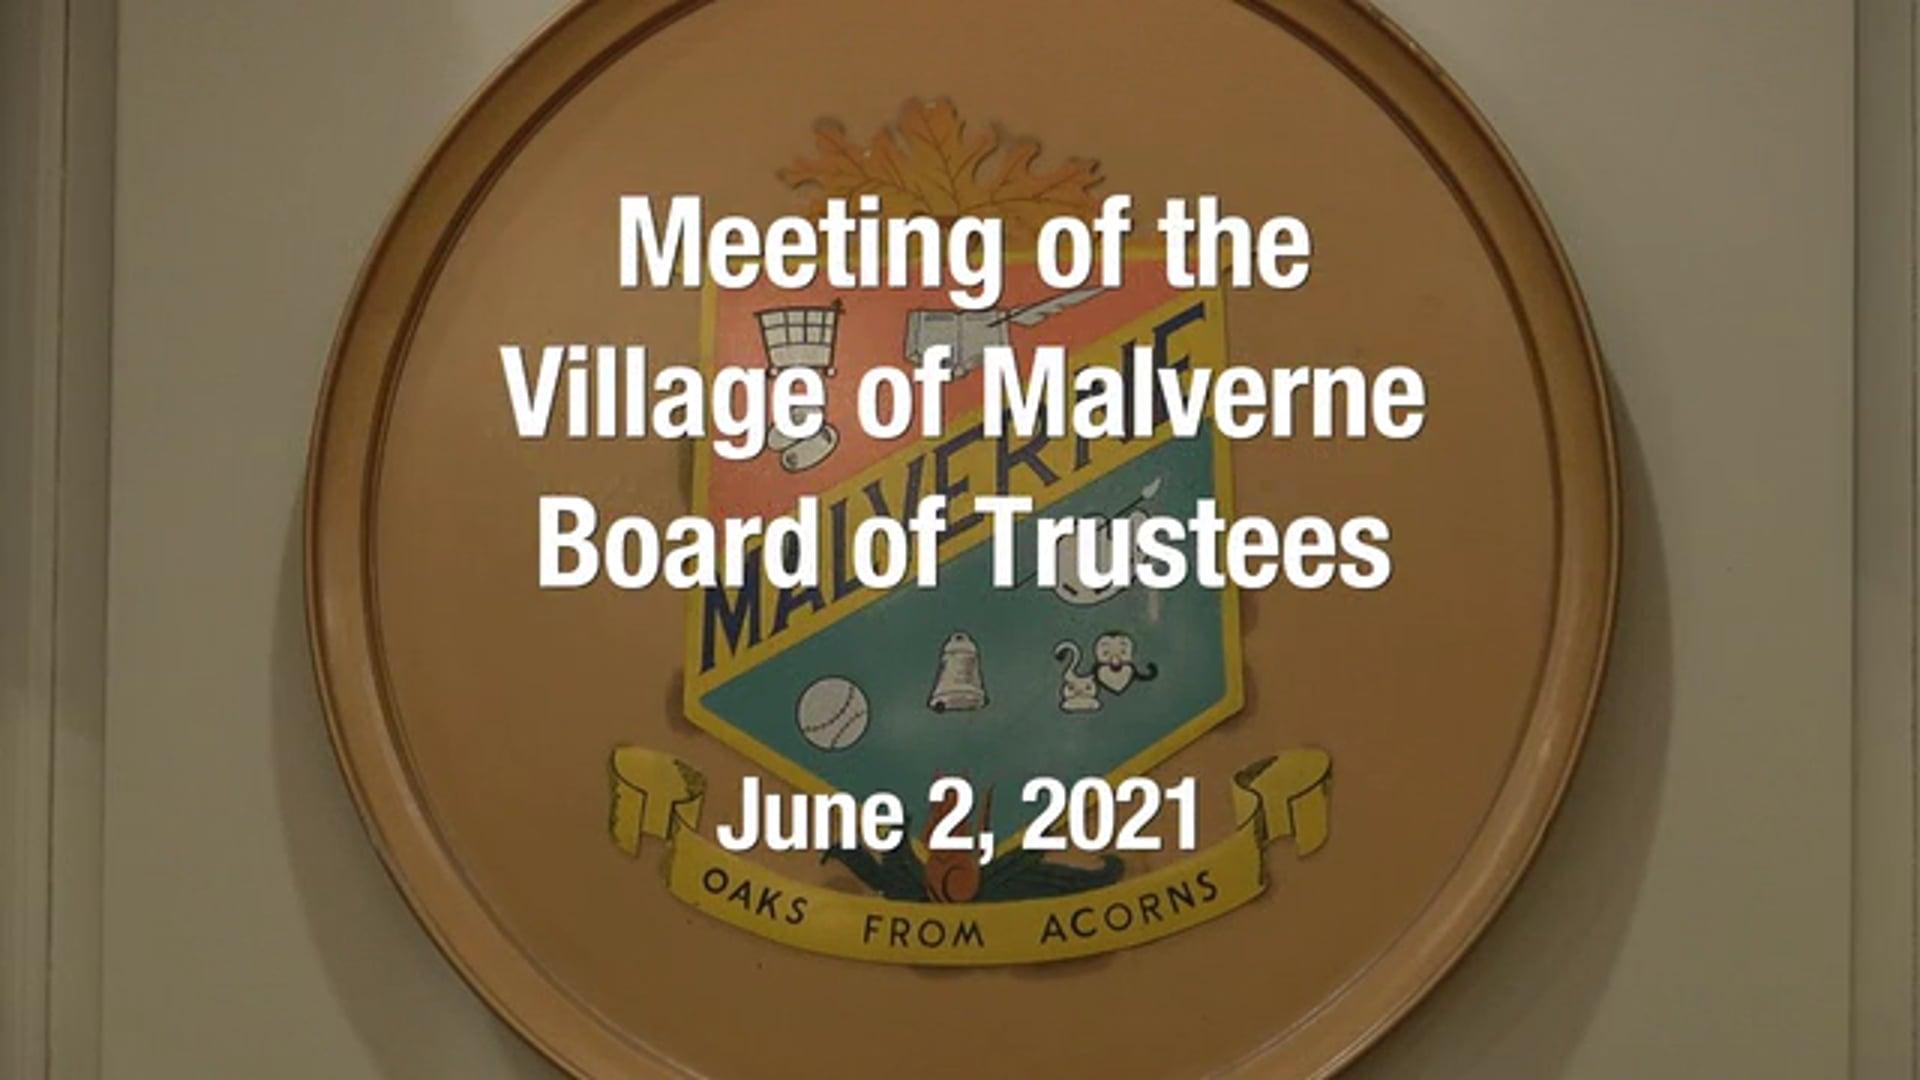 Village of Malverne - Meeting of the Board of Trustees -  June 2, 2021